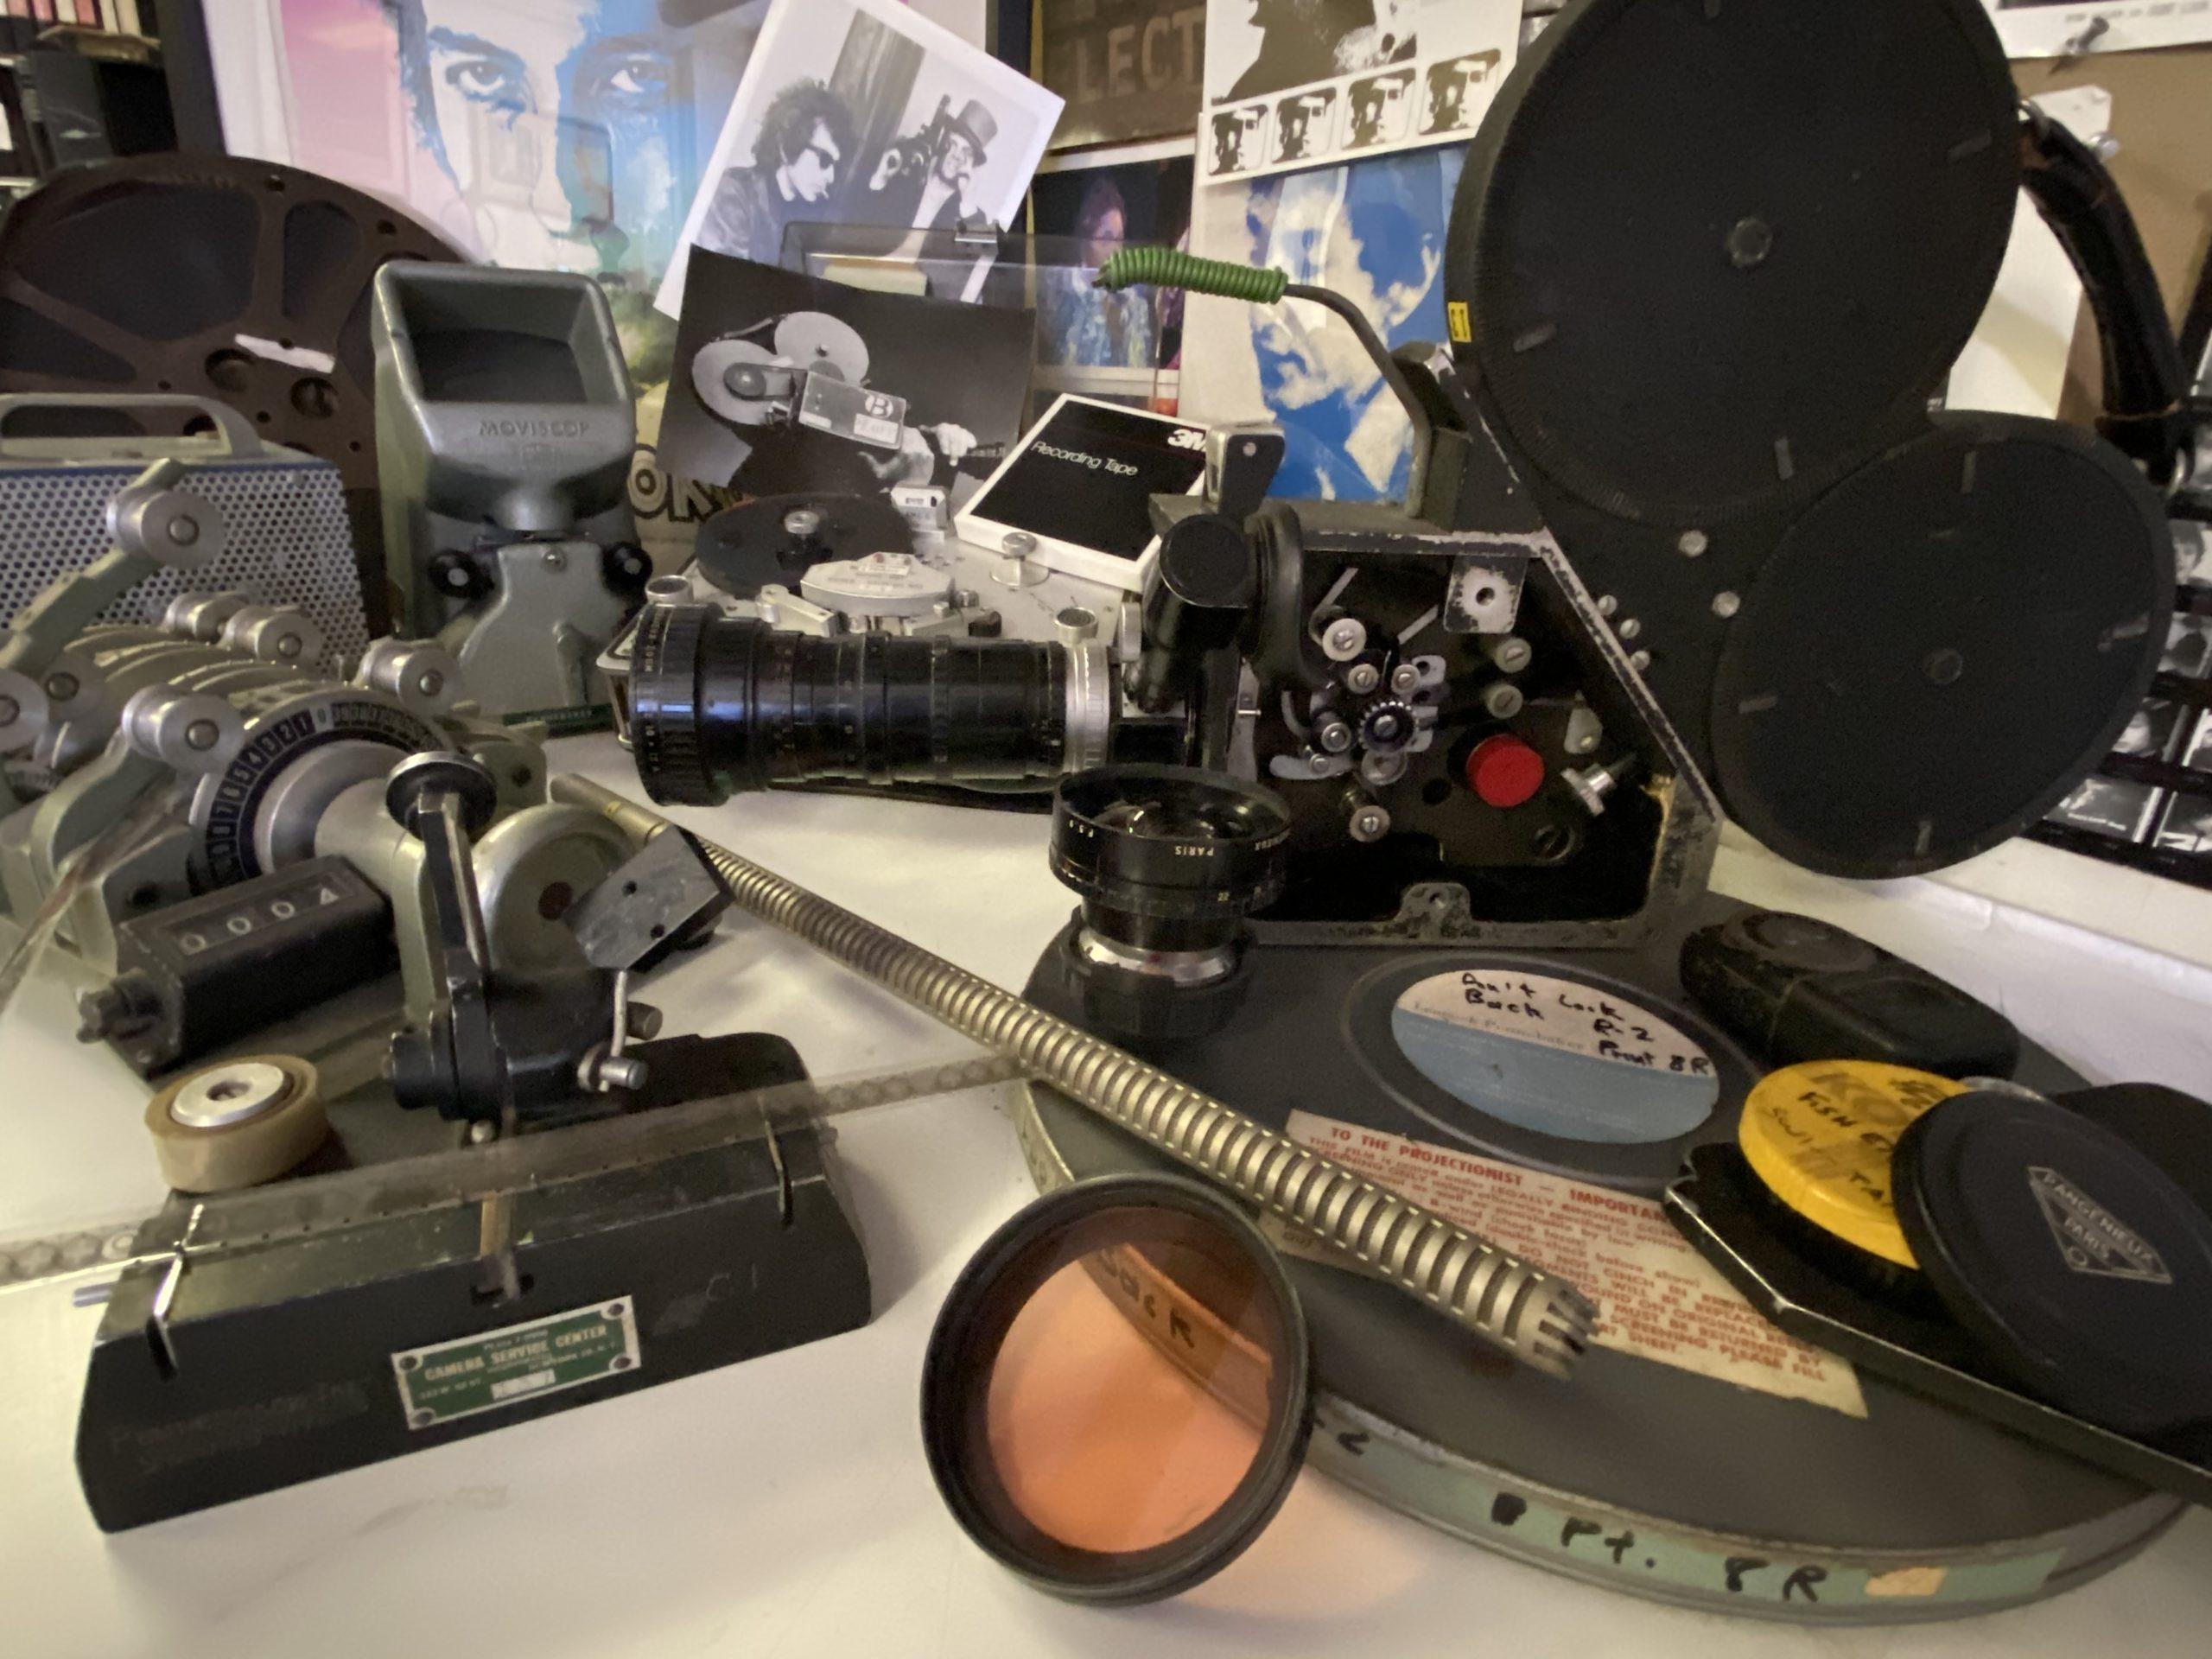 Some of D.A. Pennebaker and Chris Hegedus's filmmaking equipment.